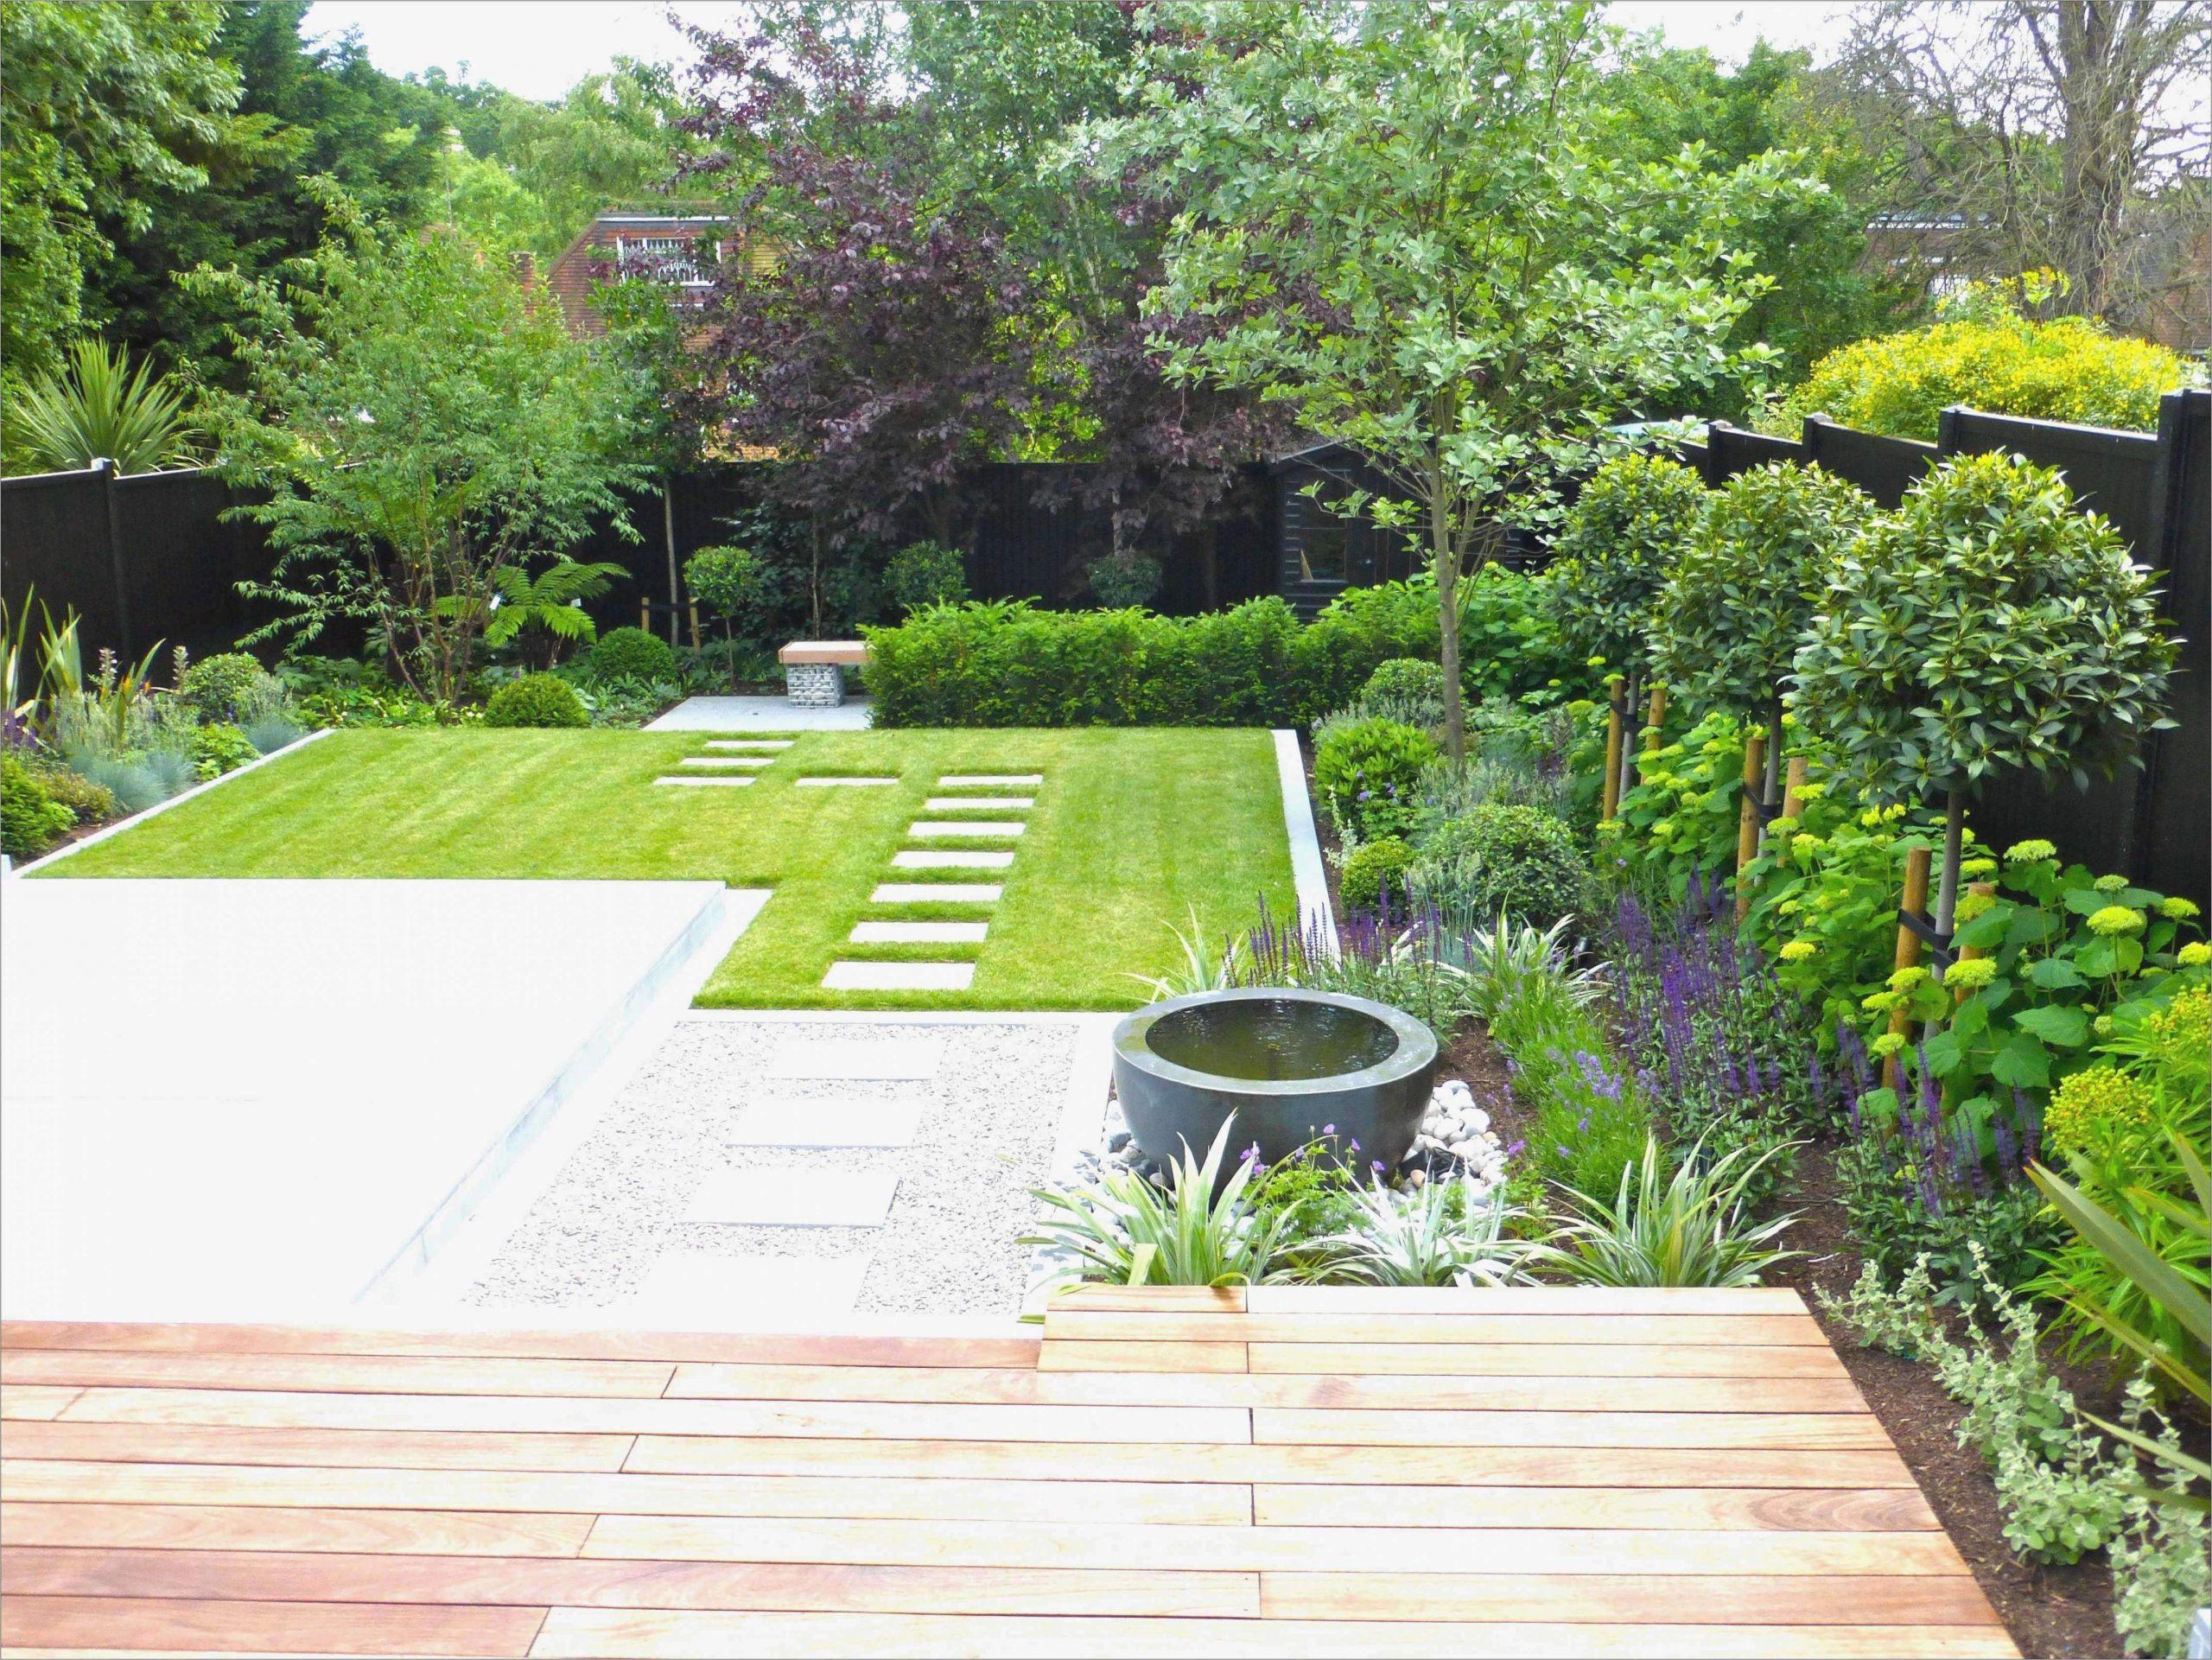 Full Size of 27 Genial Garten Loungembel Holz Luxus Anlegen Kinderspielturm Bauhaus Fenster Spielturm Wohnzimmer Spielturm Bauhaus